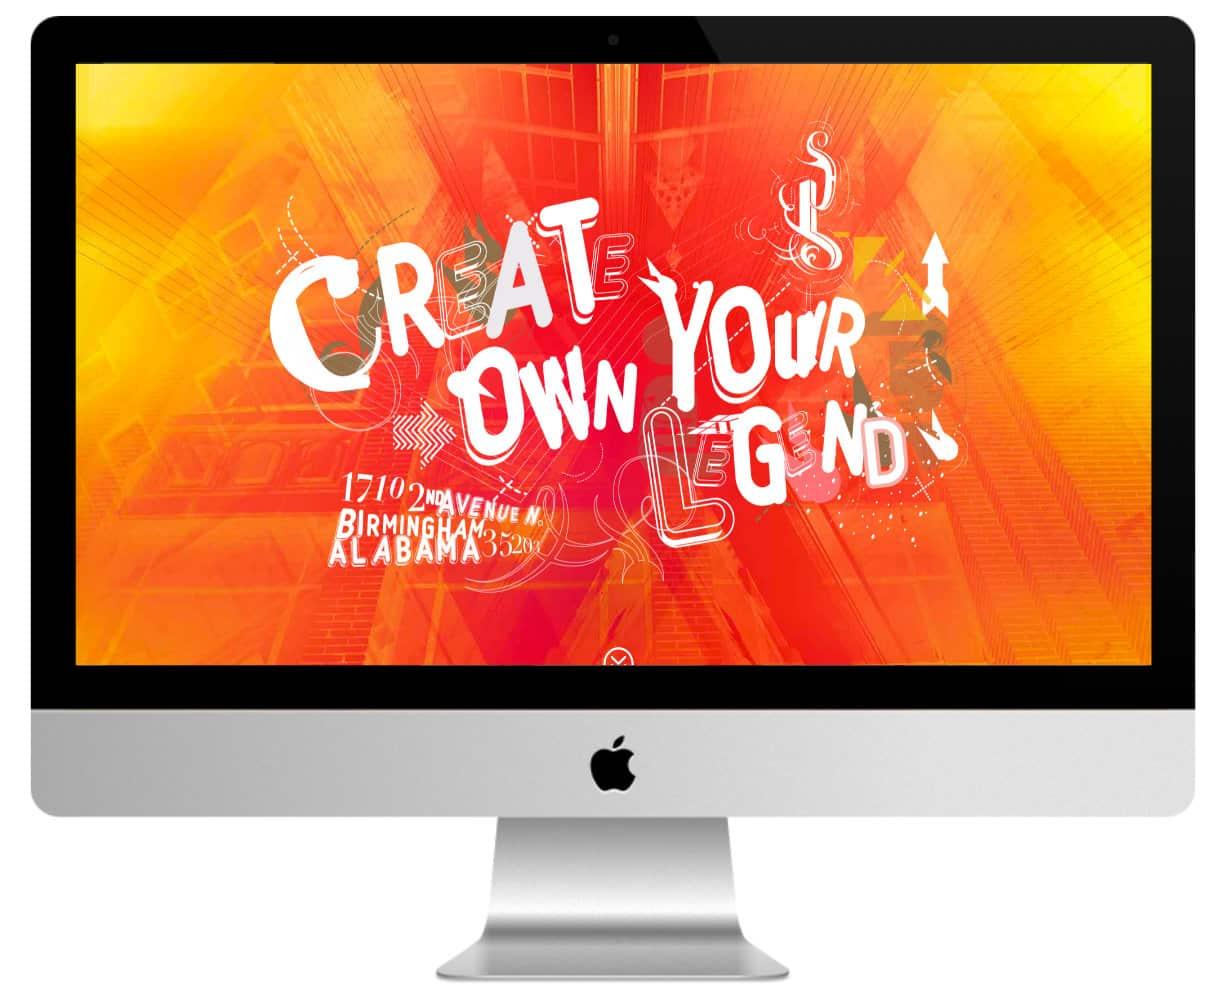 siteweb couleur orangée